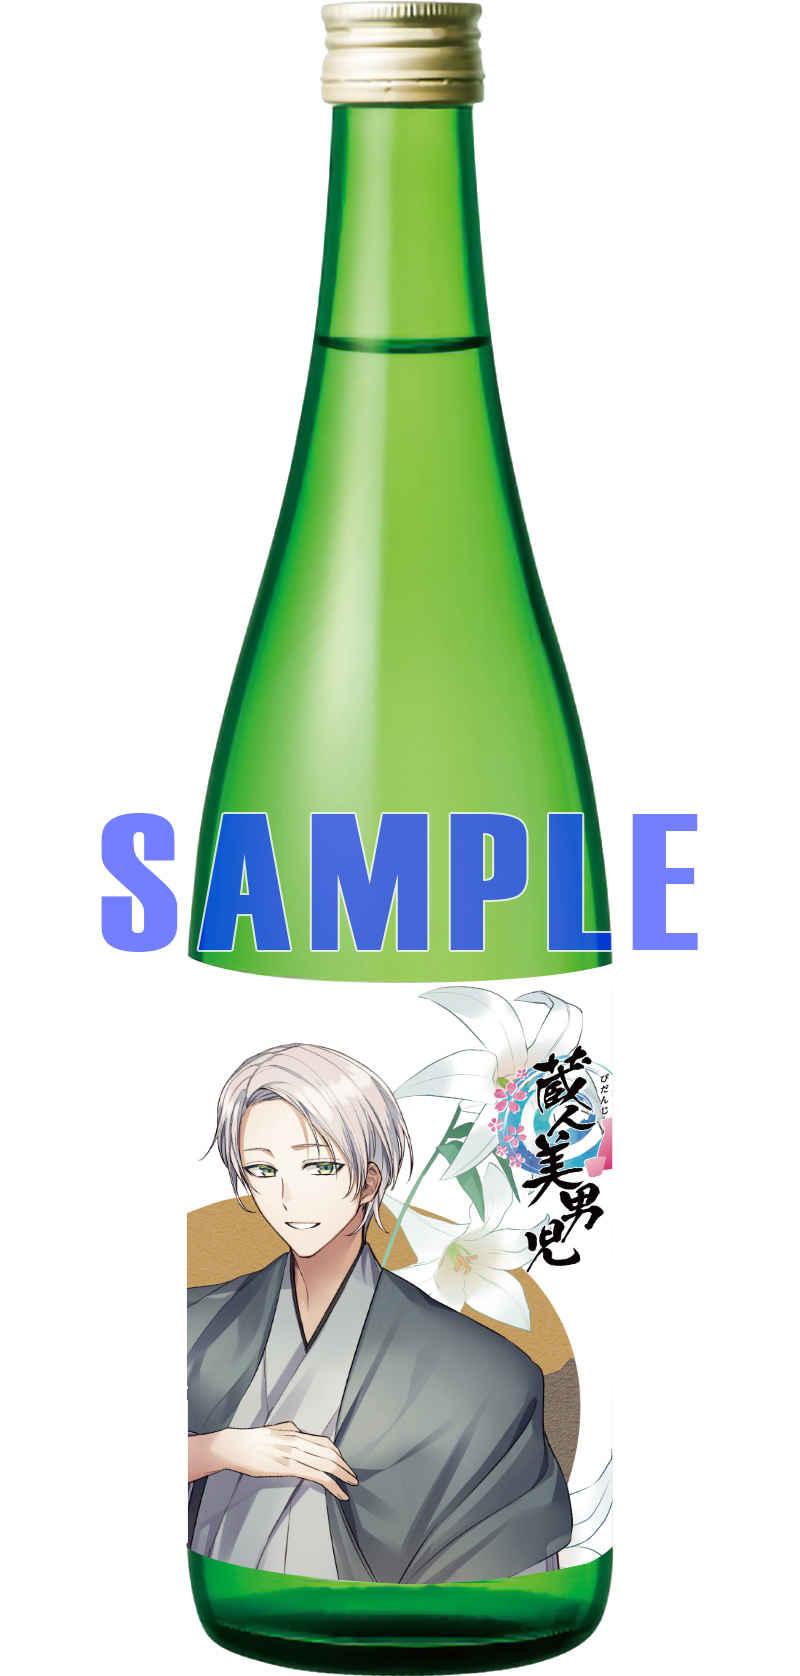 「蔵人美男児」三枝綴(絵 煮たか)清夜(純米酒)720ml